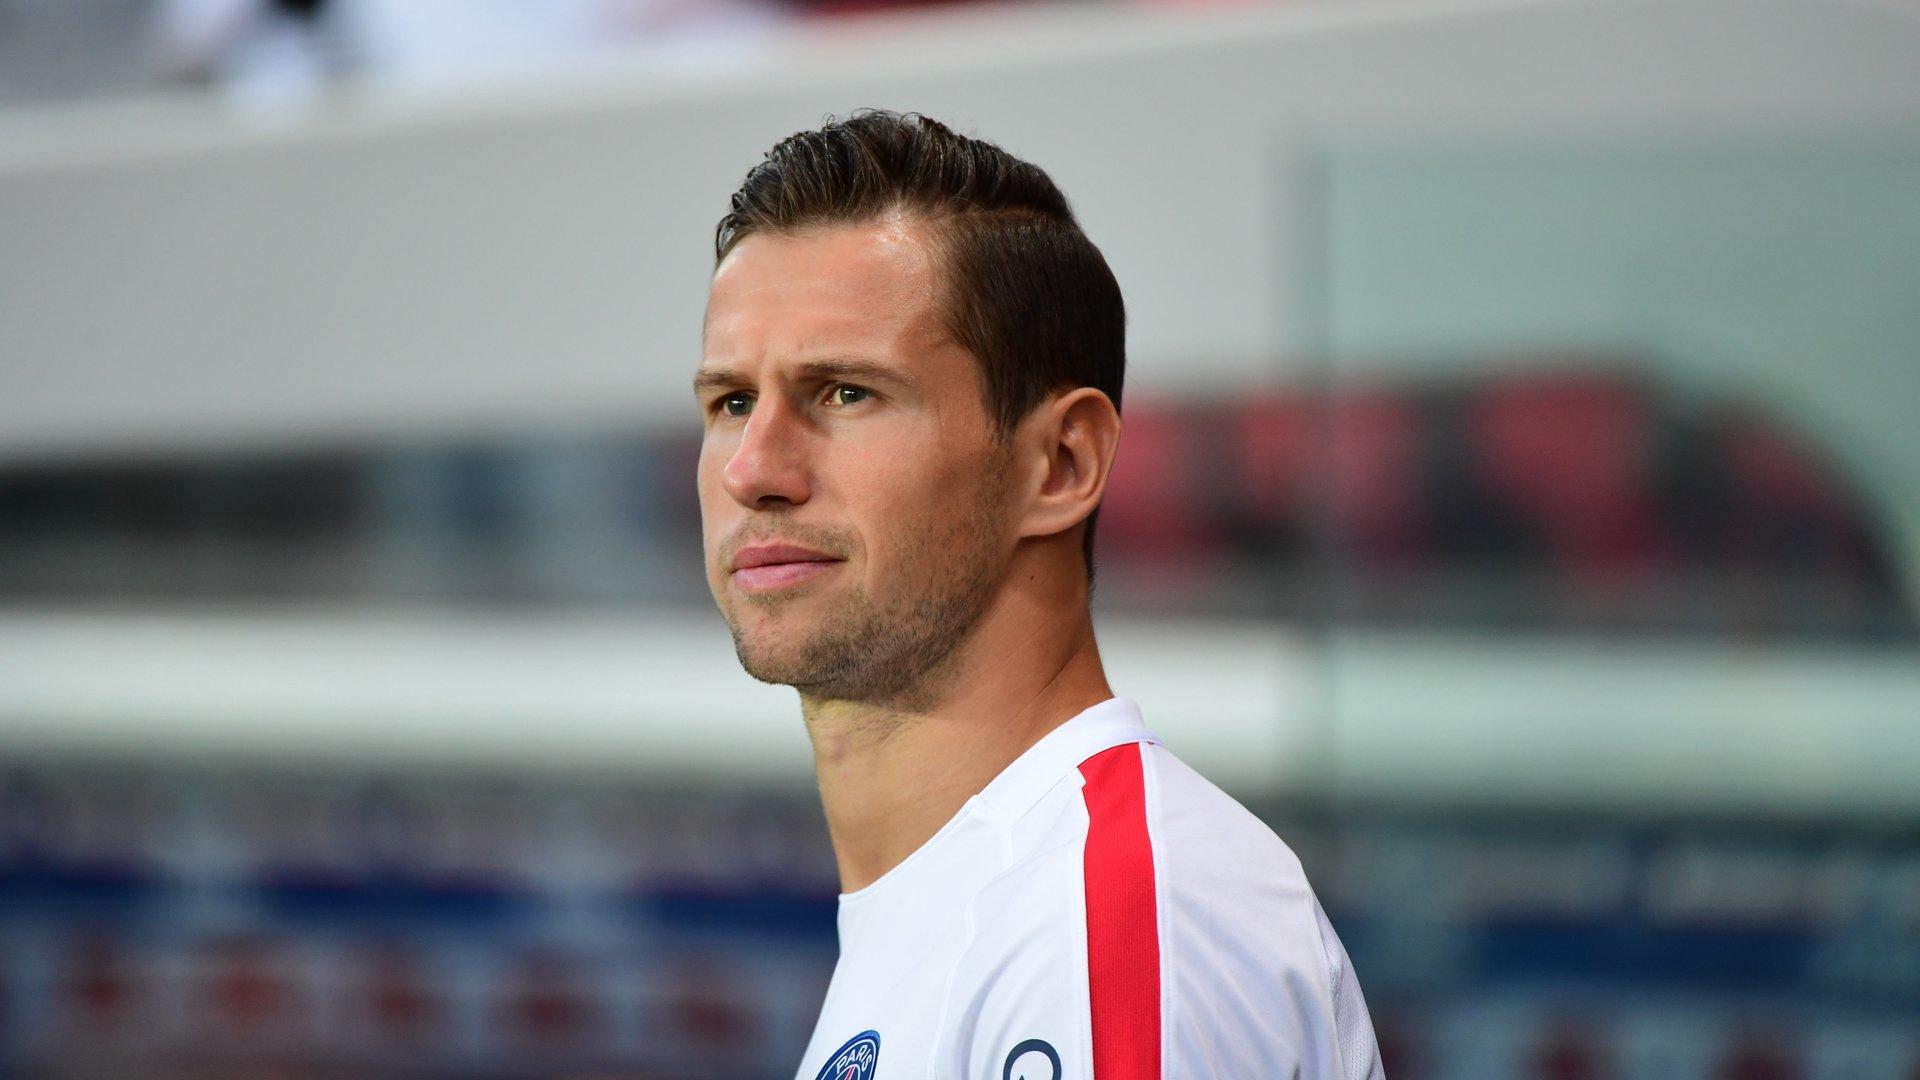 Mercato - Krychowiak devrait partir au Lokomotiv Moscou la semaine prochaine, annonce Loïc Tanzi